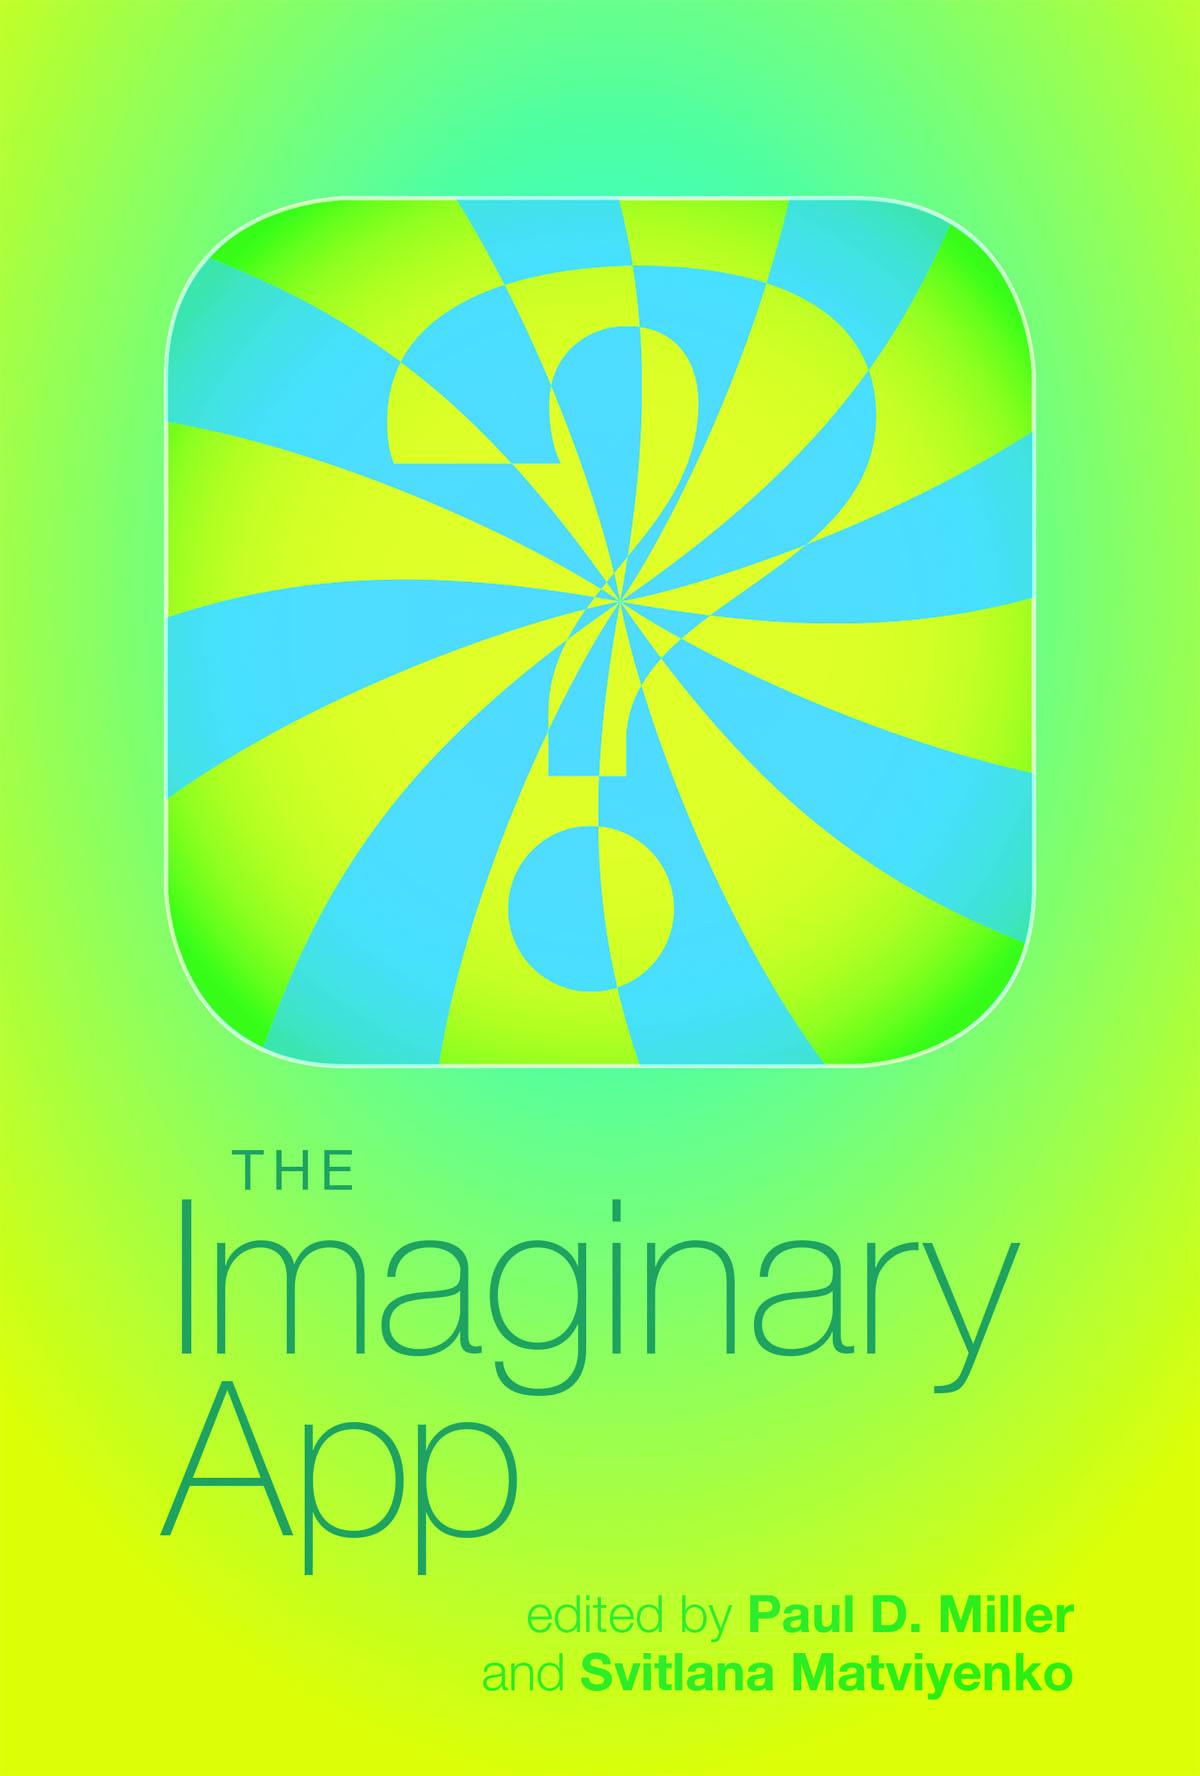 NYC Launch: The Imaginary App by Paul D. Miller (aka DJ Spooky) & Svitlana Matviyenko